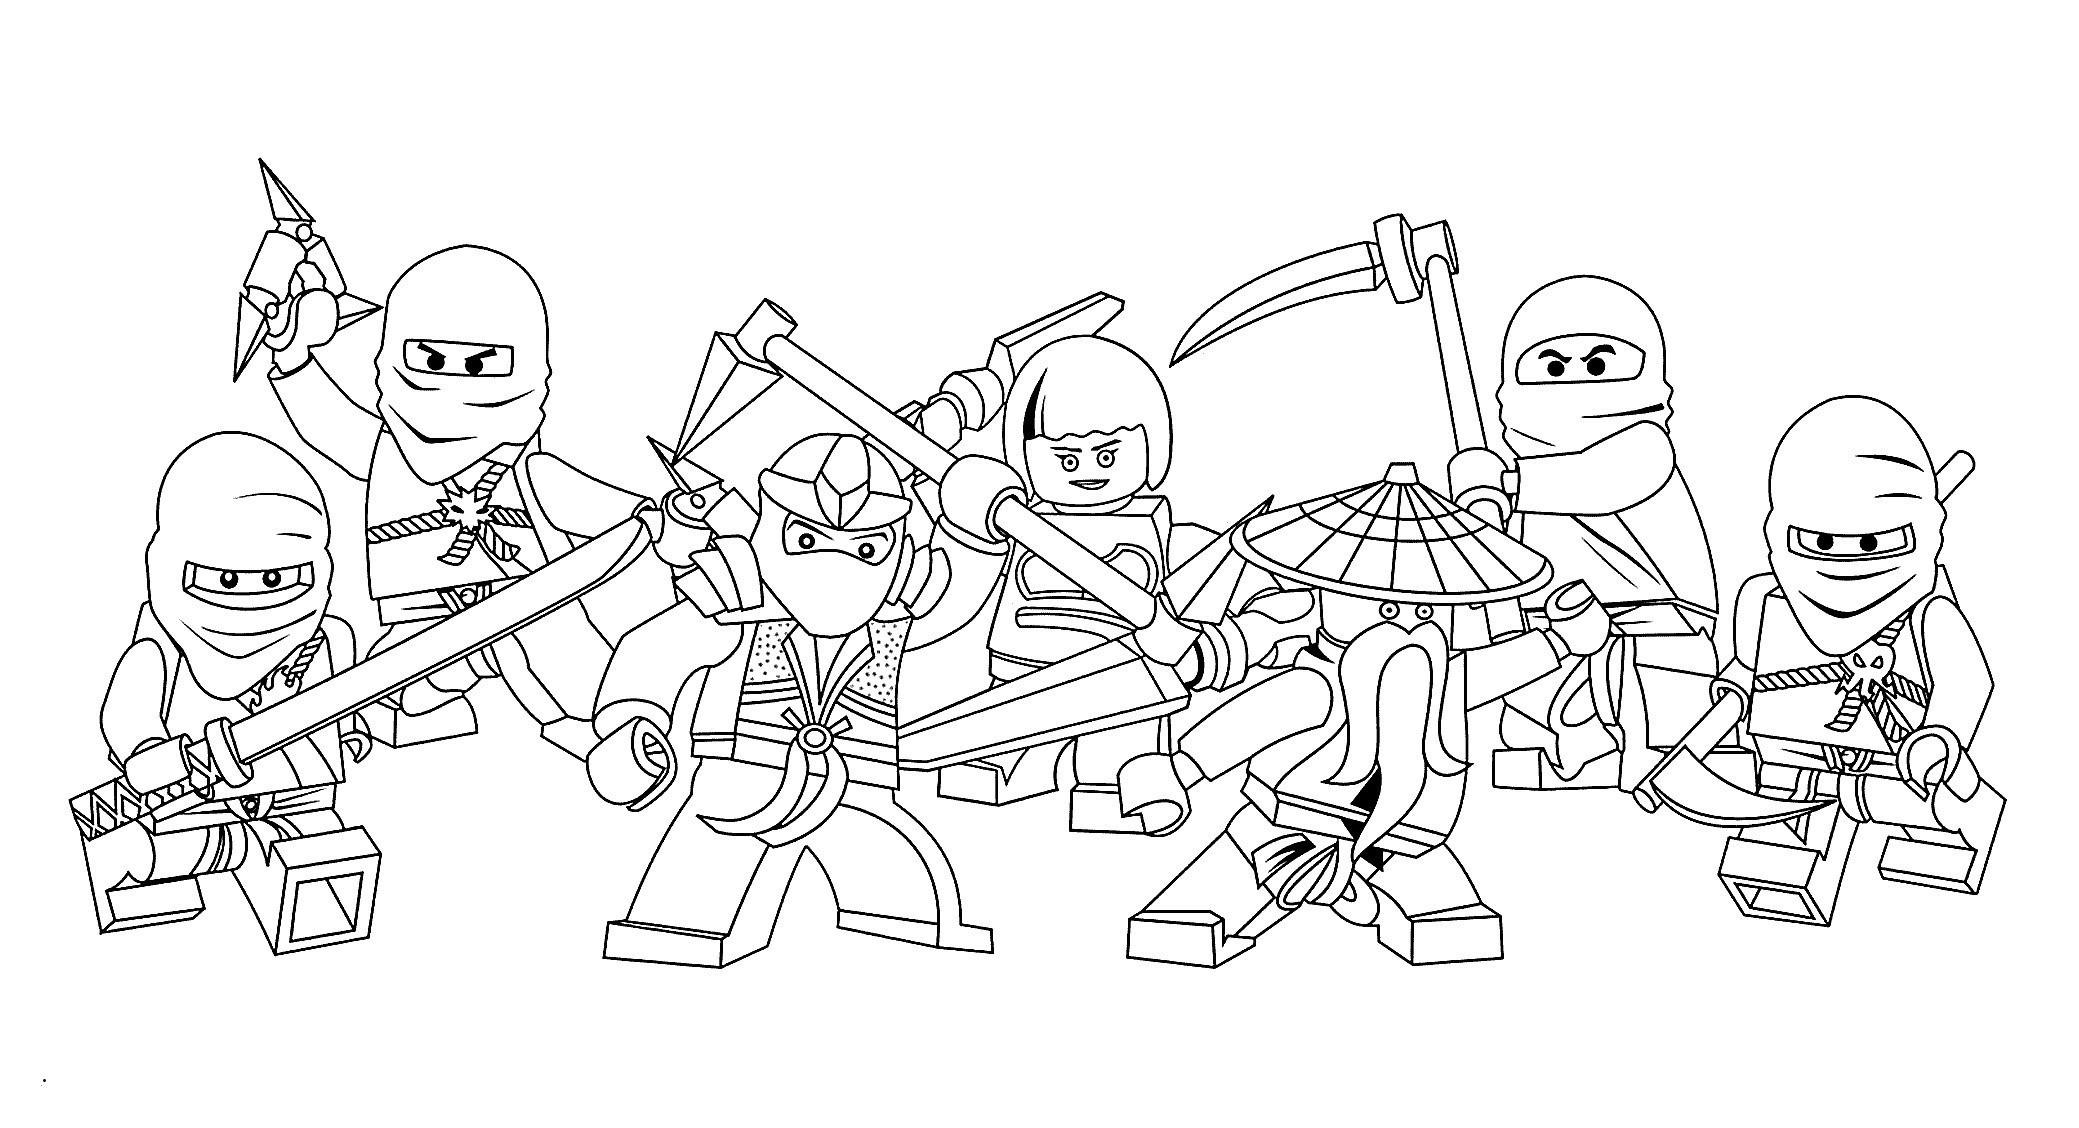 Ausmalbilder Ninjago Zane Inspirierend Ninjago Ausmalbilder Lloyd 2015 Inspirierend Free Printable Lego Stock